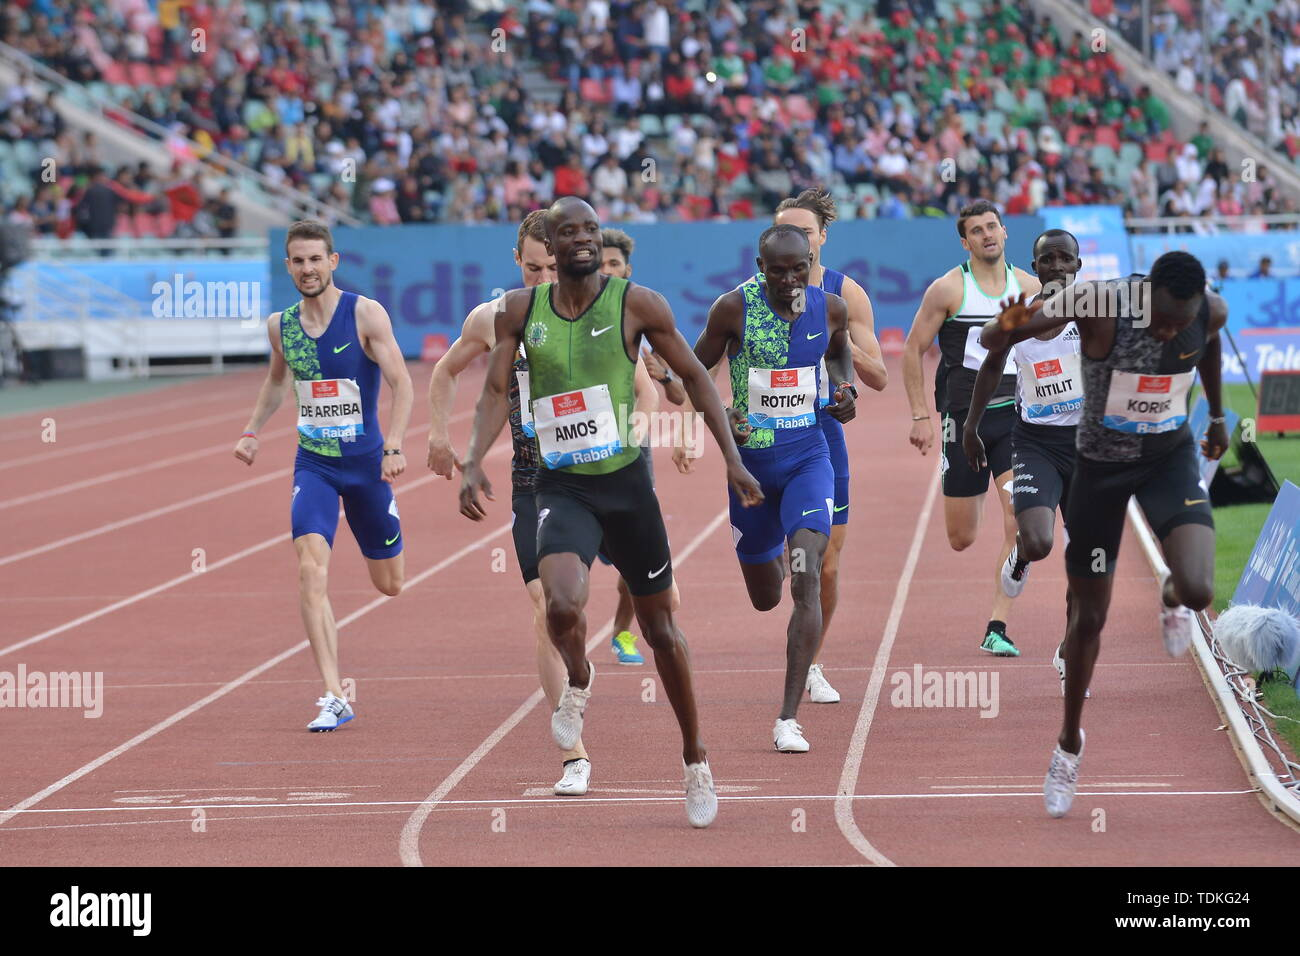 (190617)-- RABAT, June 17, 2019 (Xinhua) -- Nijel Amos(Front L) of Botswana reacts after the men's 800m at 2019 IAAF Diamond League in Rabat, capital of Morocco, on June 16, 2019. Nijel Amos won the 1st place with 1:45.57. (Xinhua/Chadi) - Stock Image